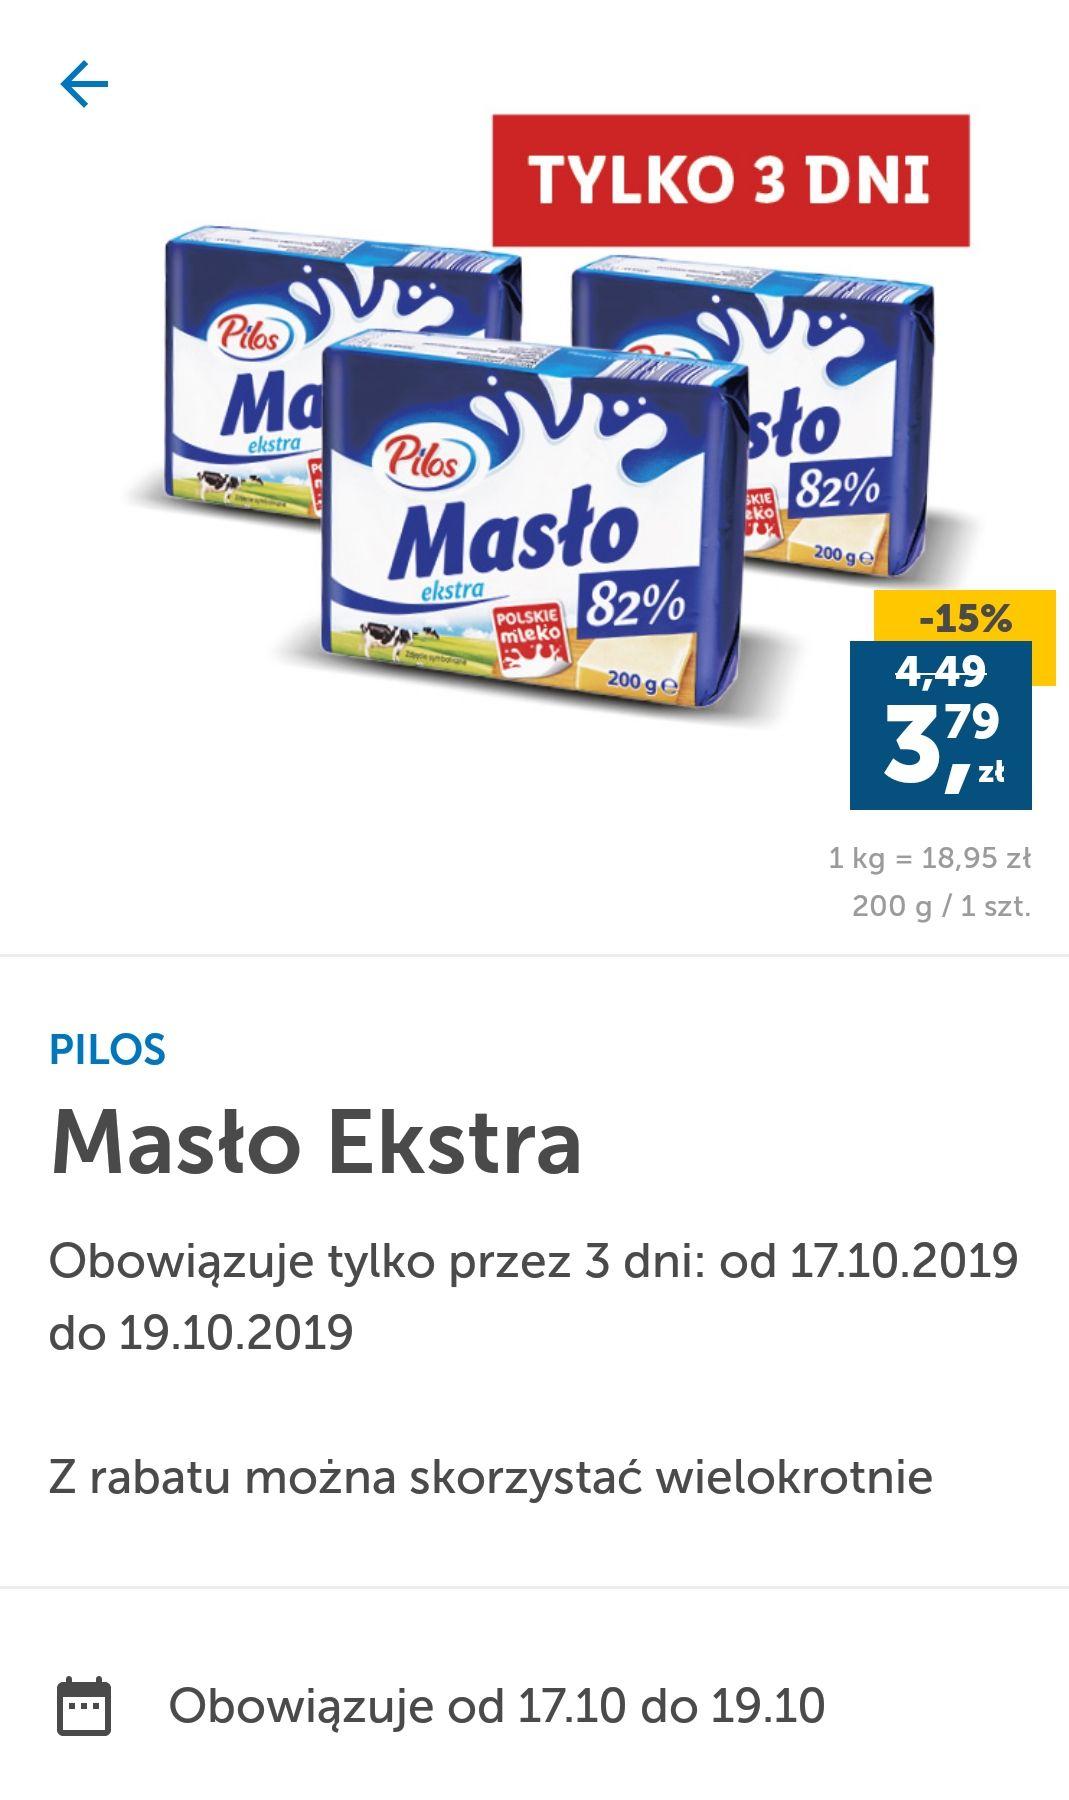 LIDL maslo ekstra PILOS Max 3 szt.